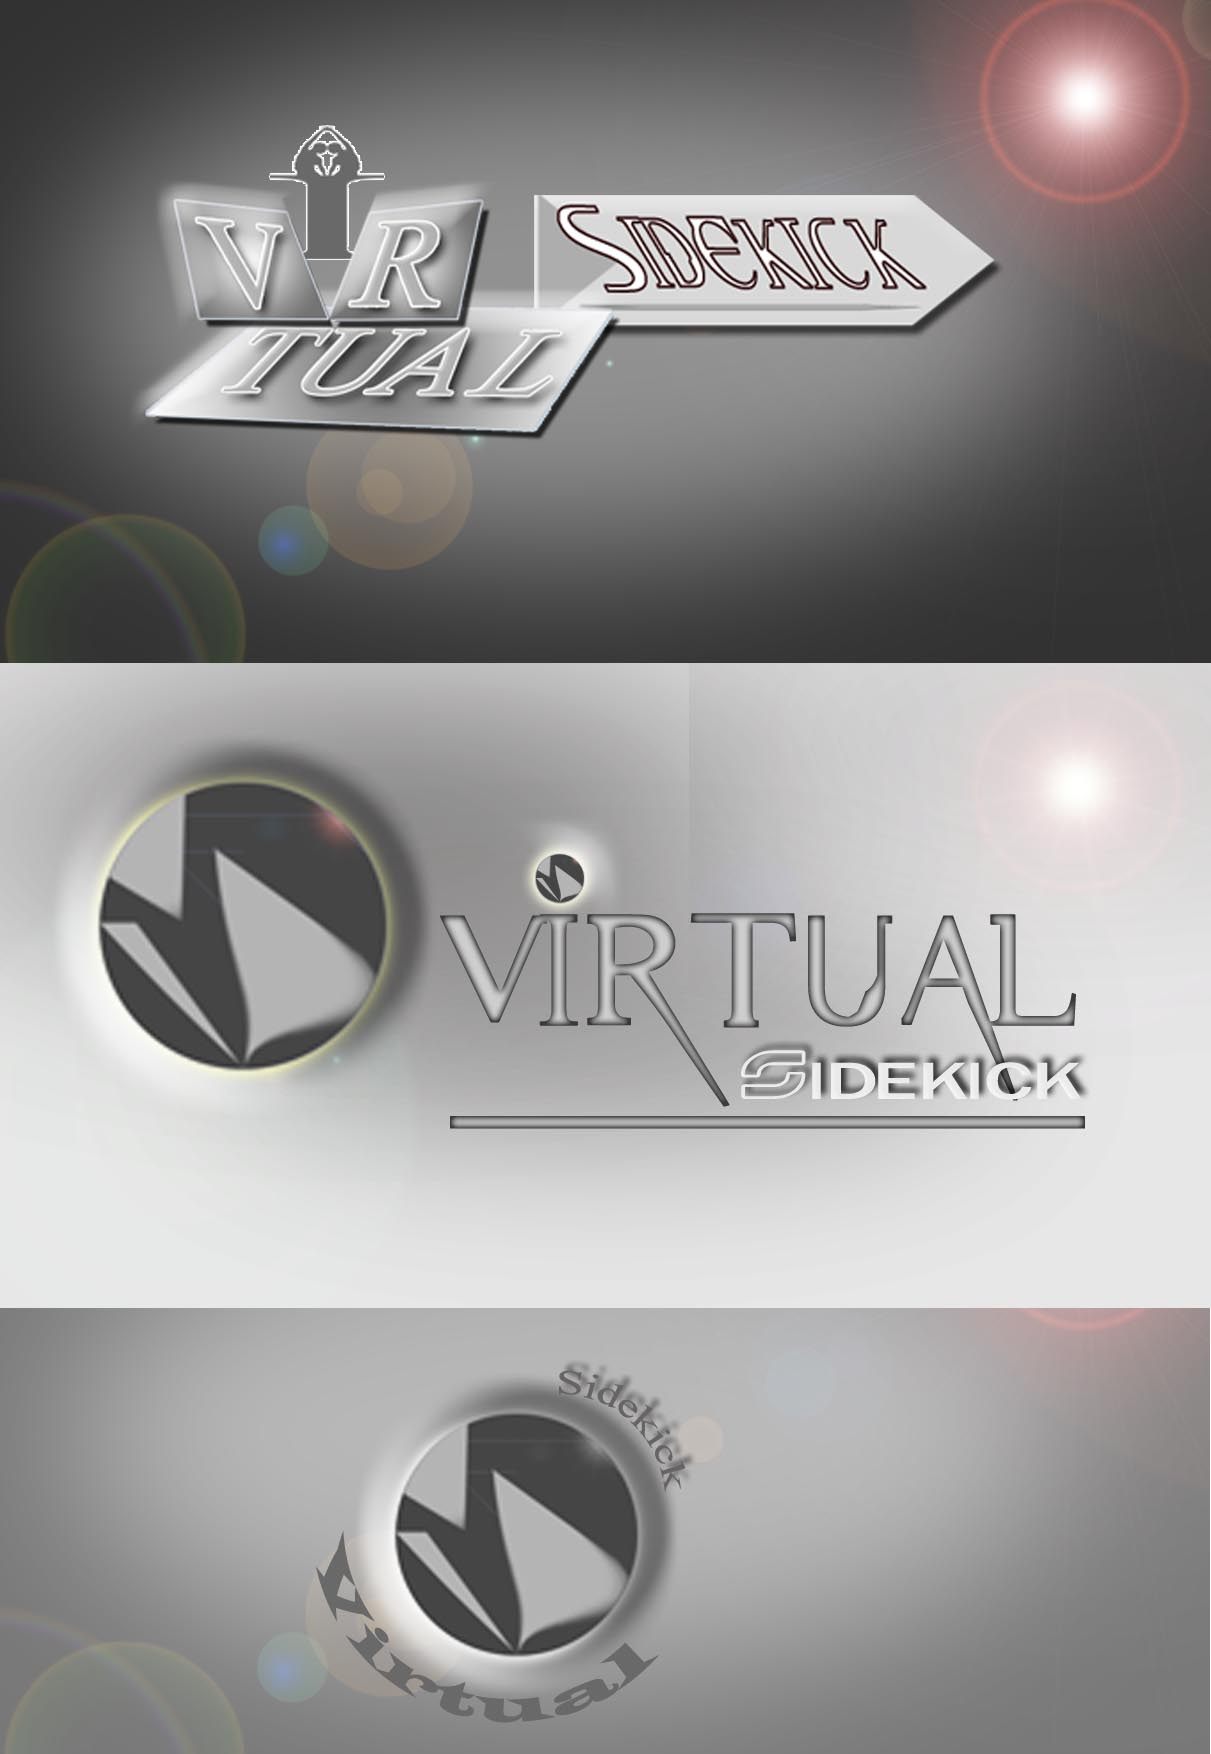 Logo Design by faza-bejo - Entry No. 72 in the Logo Design Contest Fun Logo Design for Virtual Sidekick.